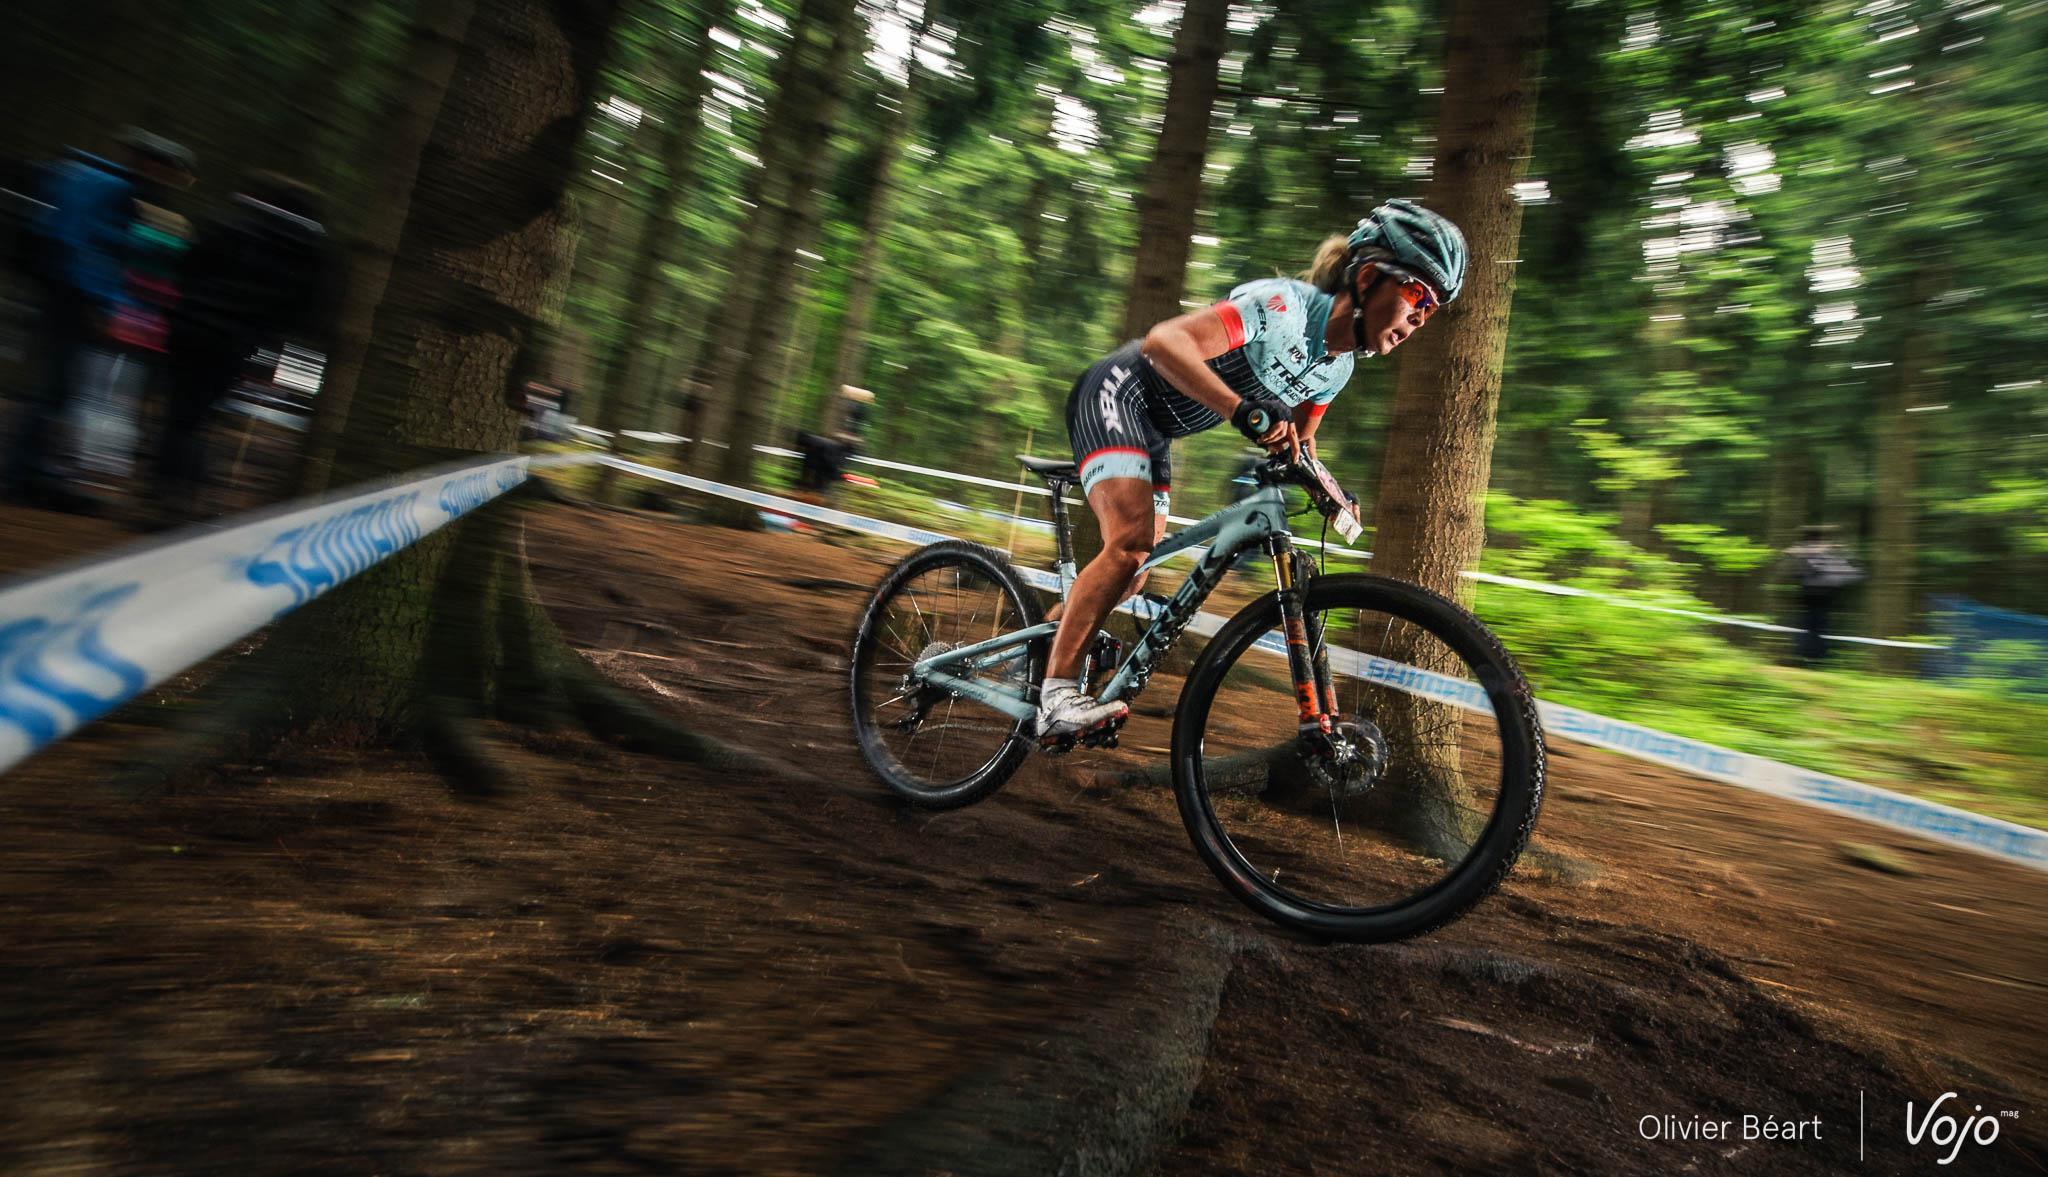 Trek_Top_Fuel_2016_Copyright_OBeart_VojoMag-1